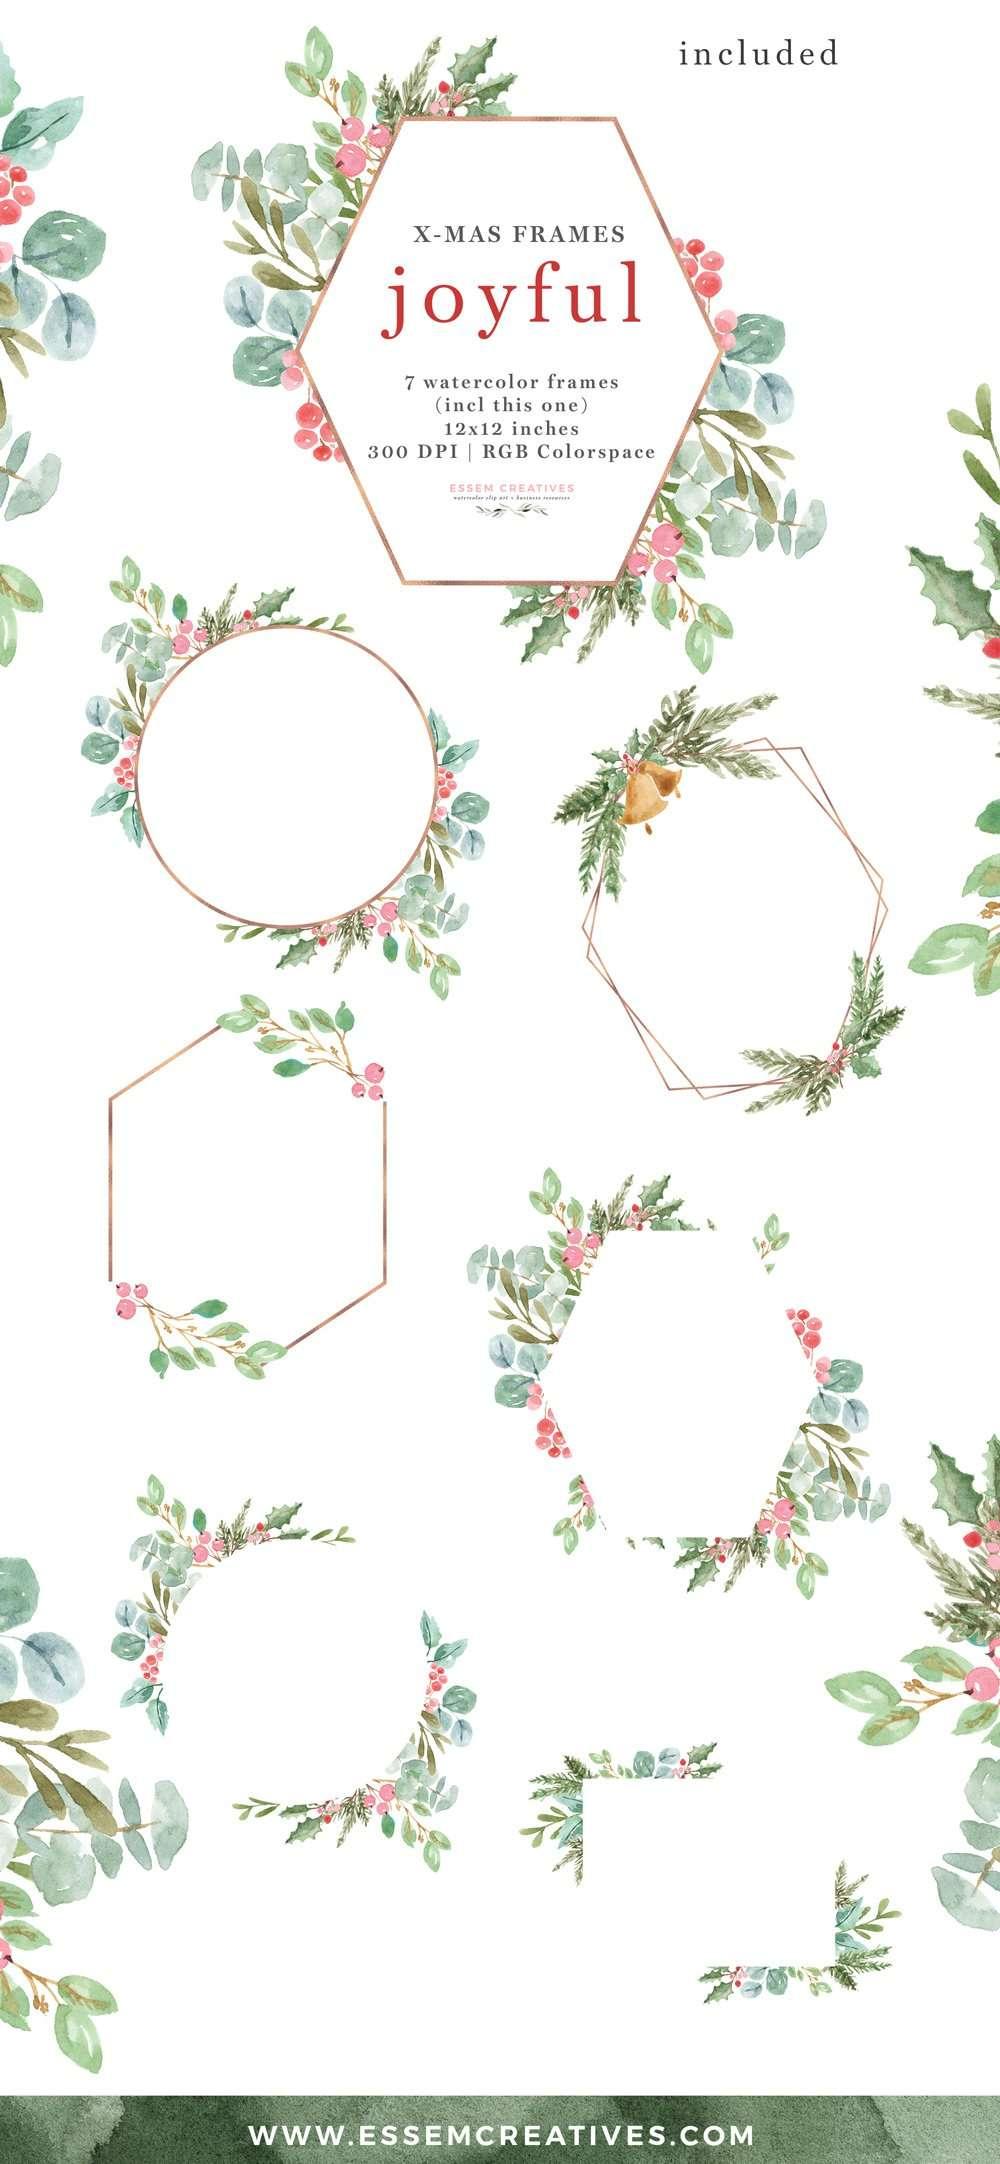 Christmas Frames Clipart Rose Gold Geometric | Essem Creatives